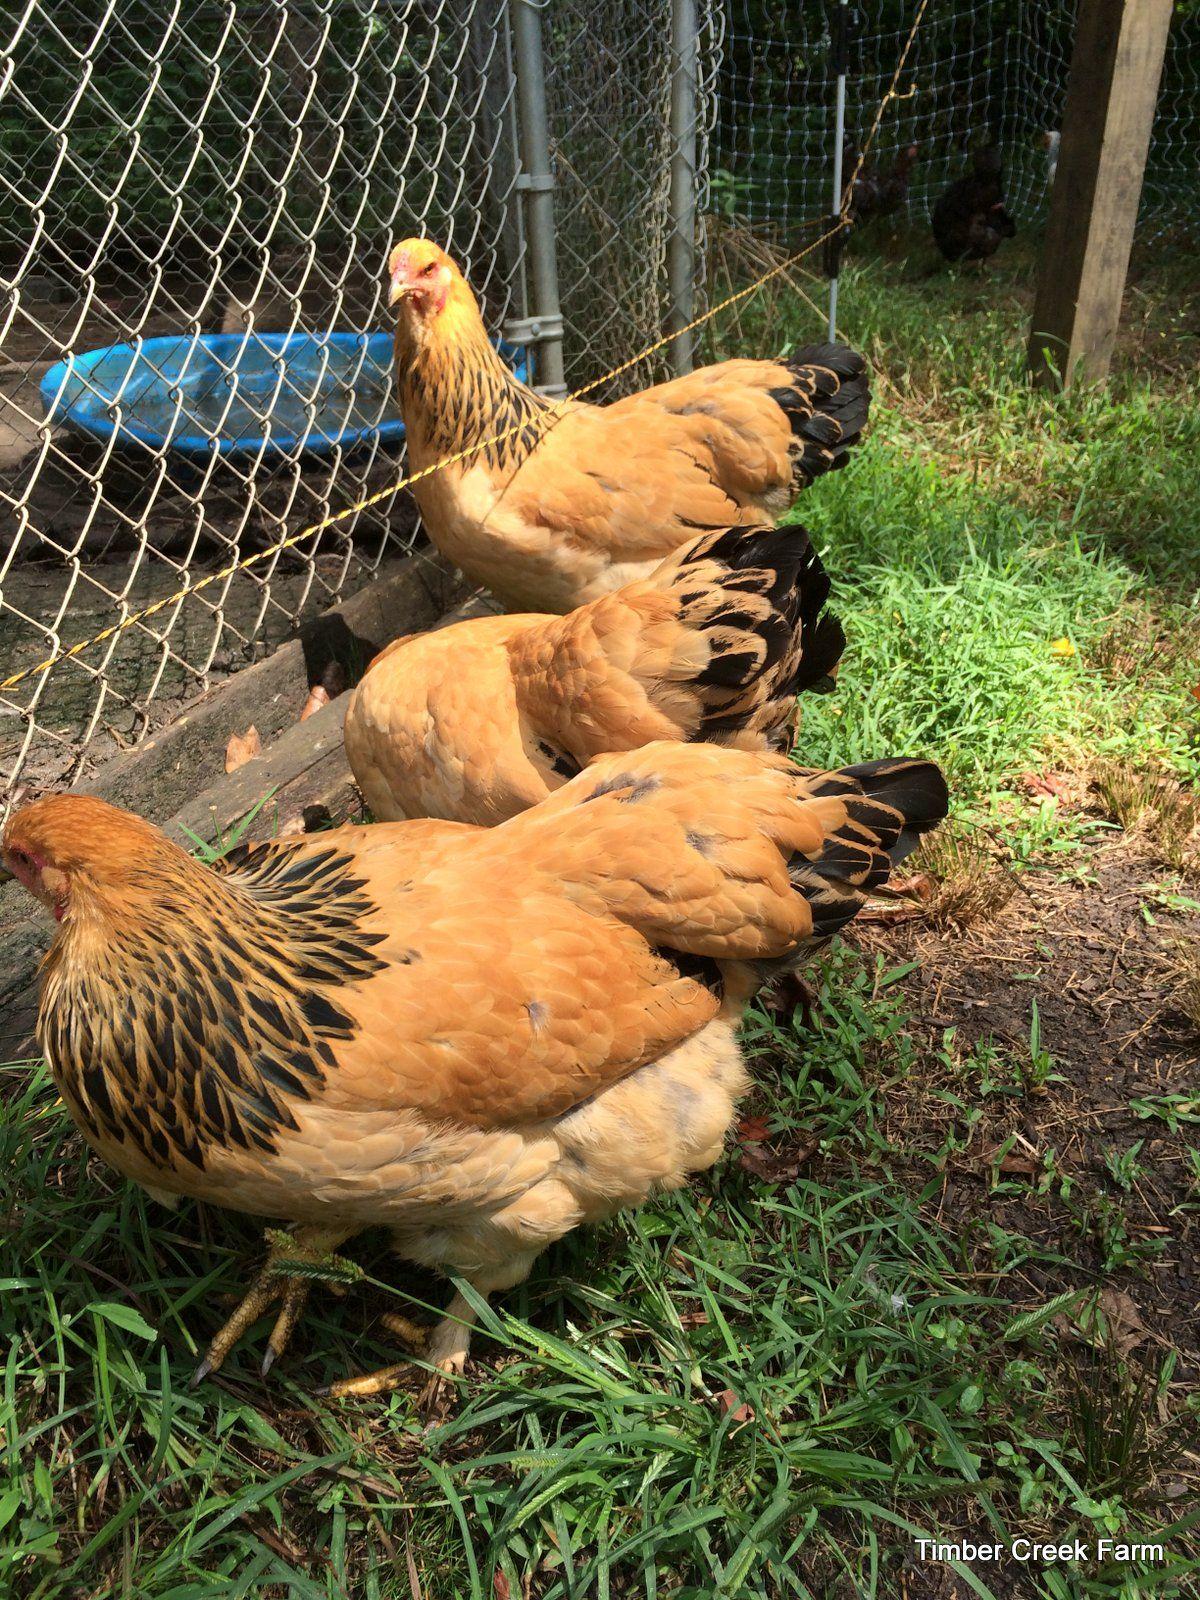 The Brahma Chicken – Raising a Breed